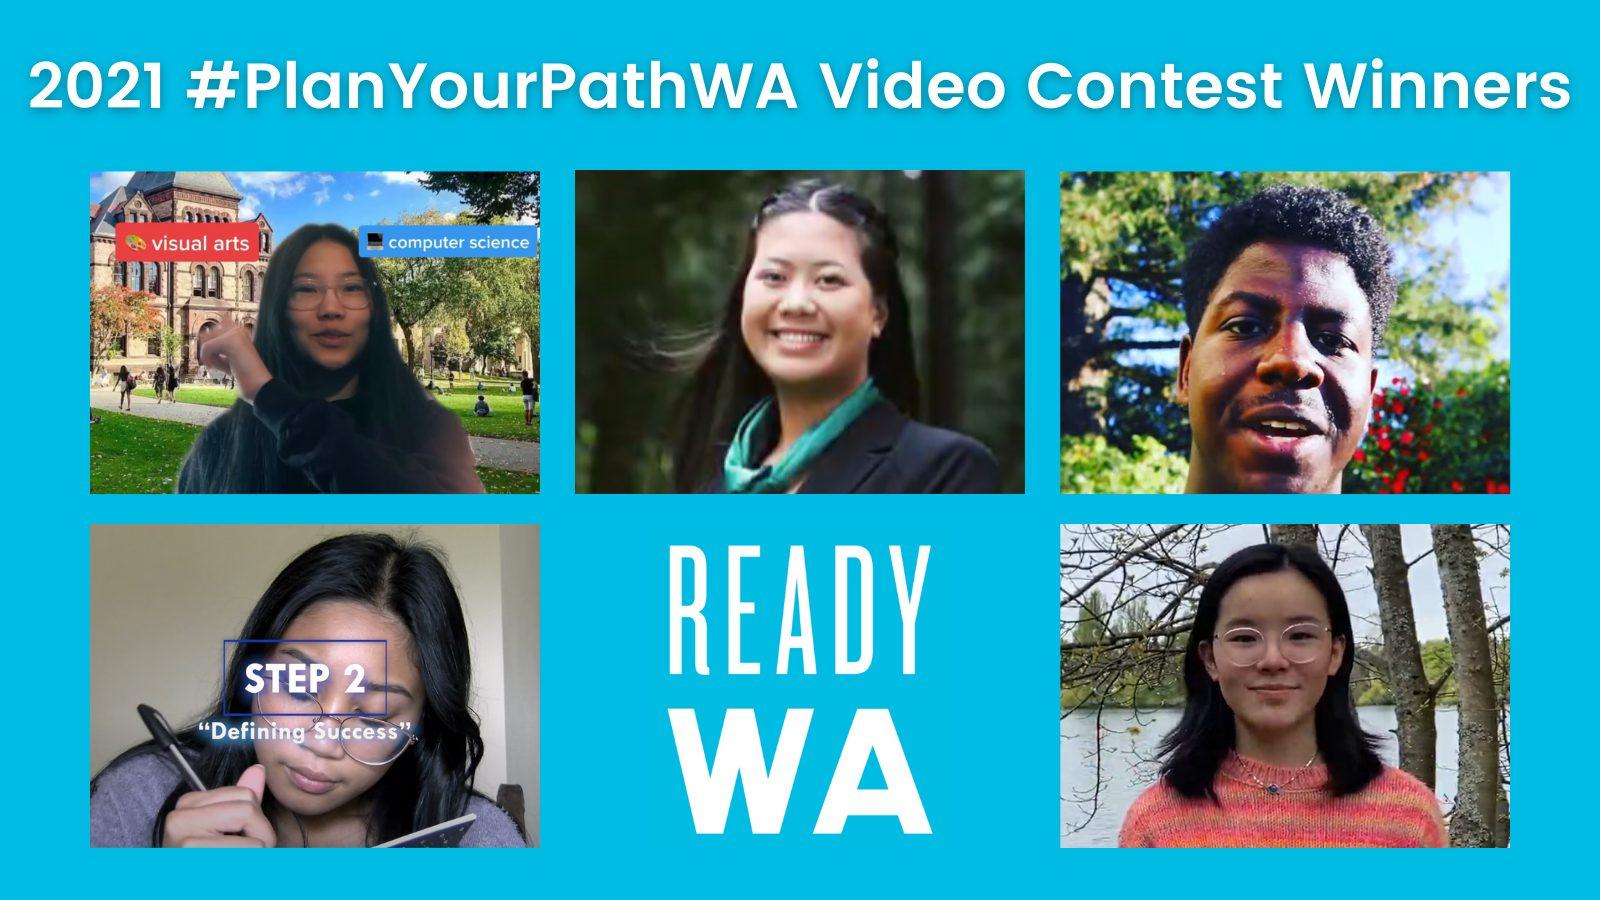 2021 #PlanYourPathWA Student Video Contest